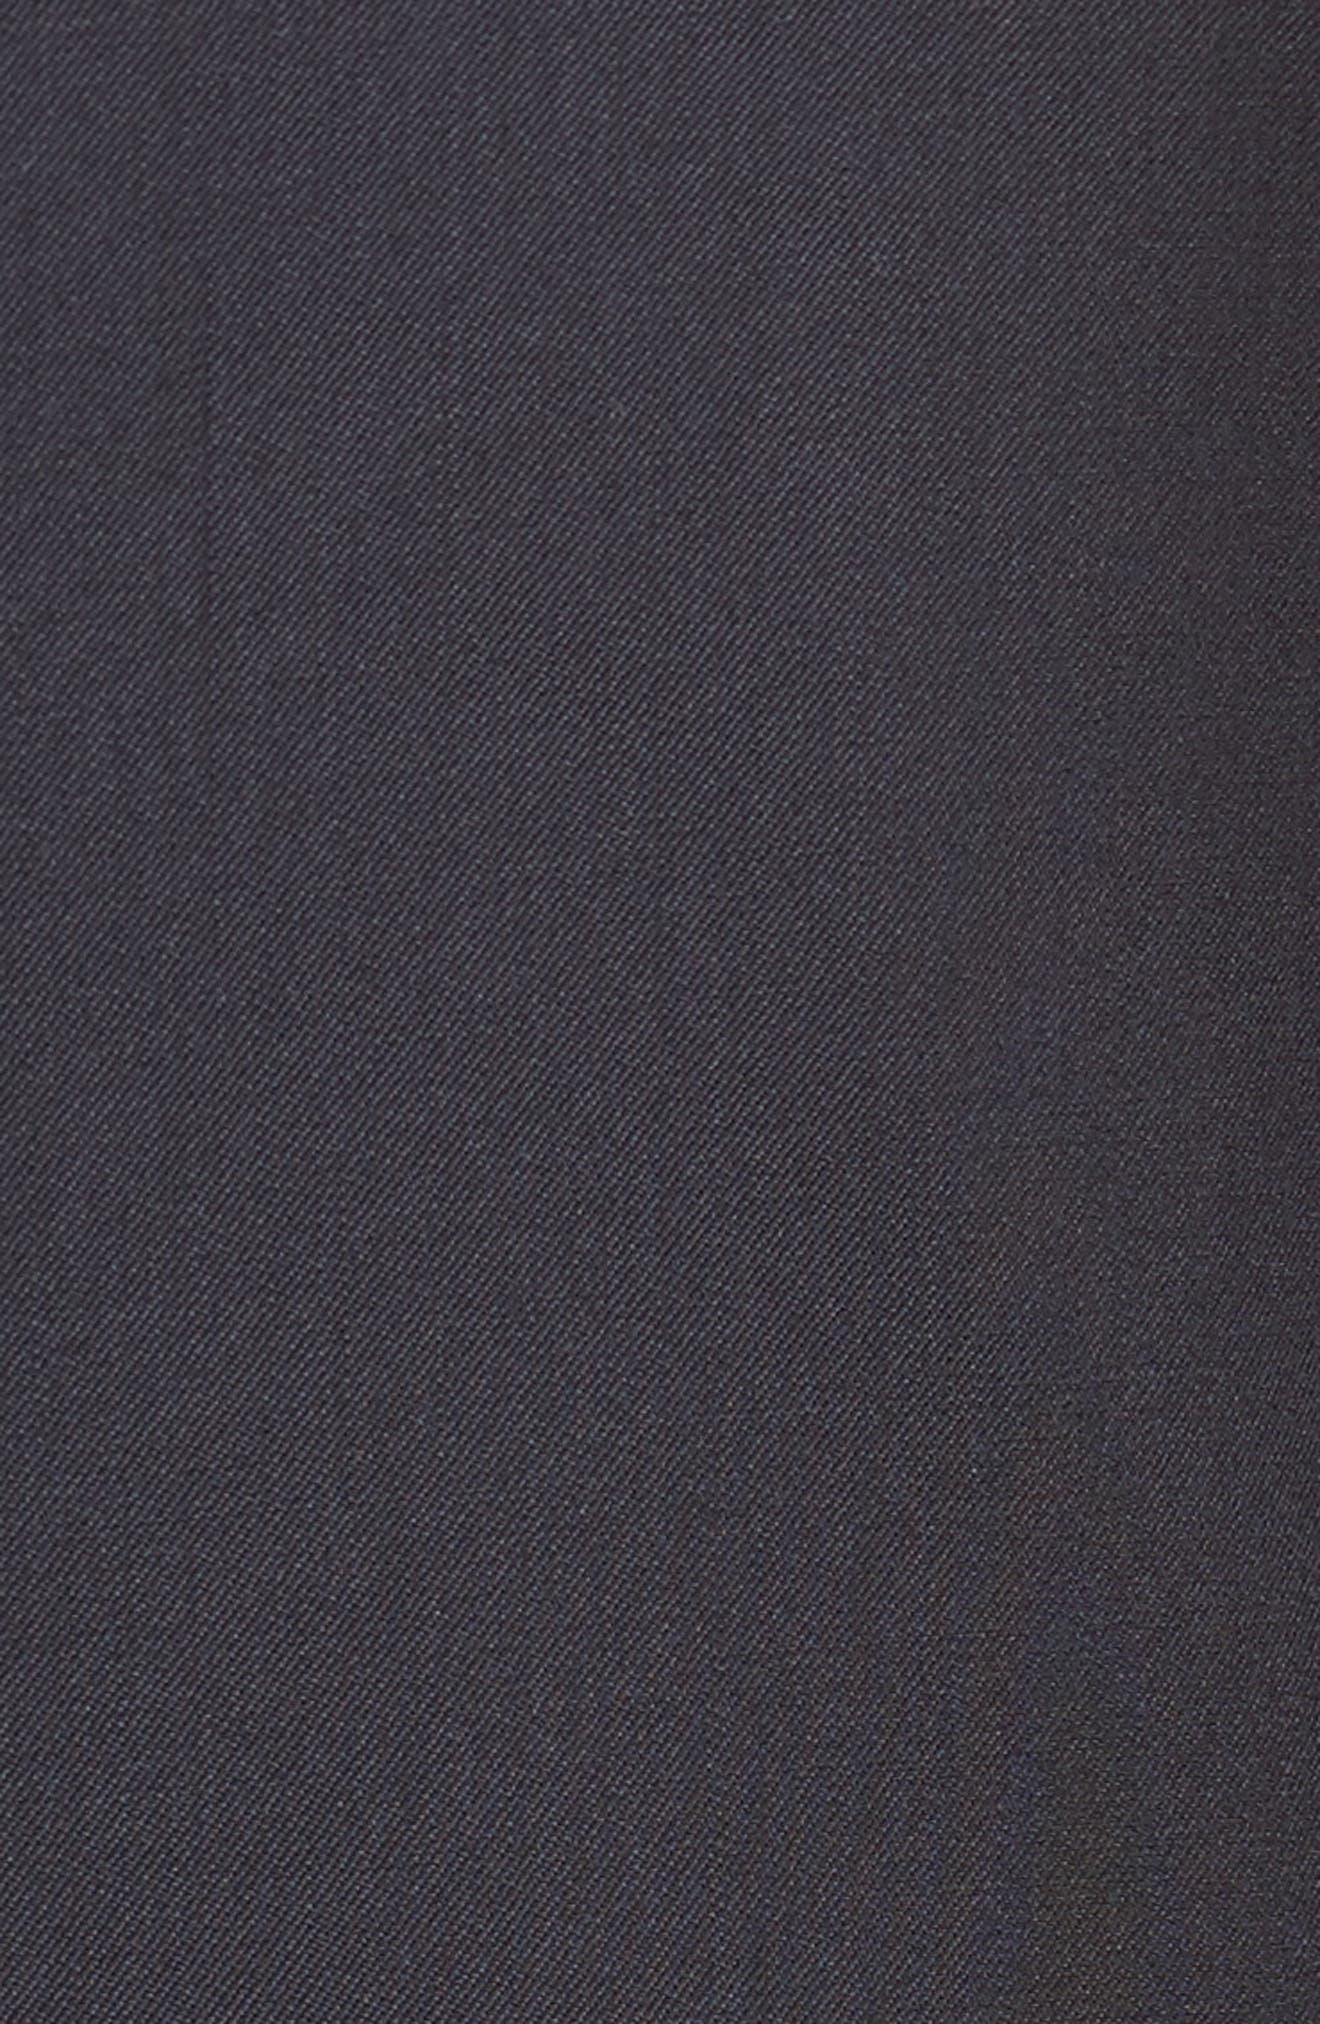 Trim Fit Solid Wool Suit,                             Alternate thumbnail 7, color,                             Navy